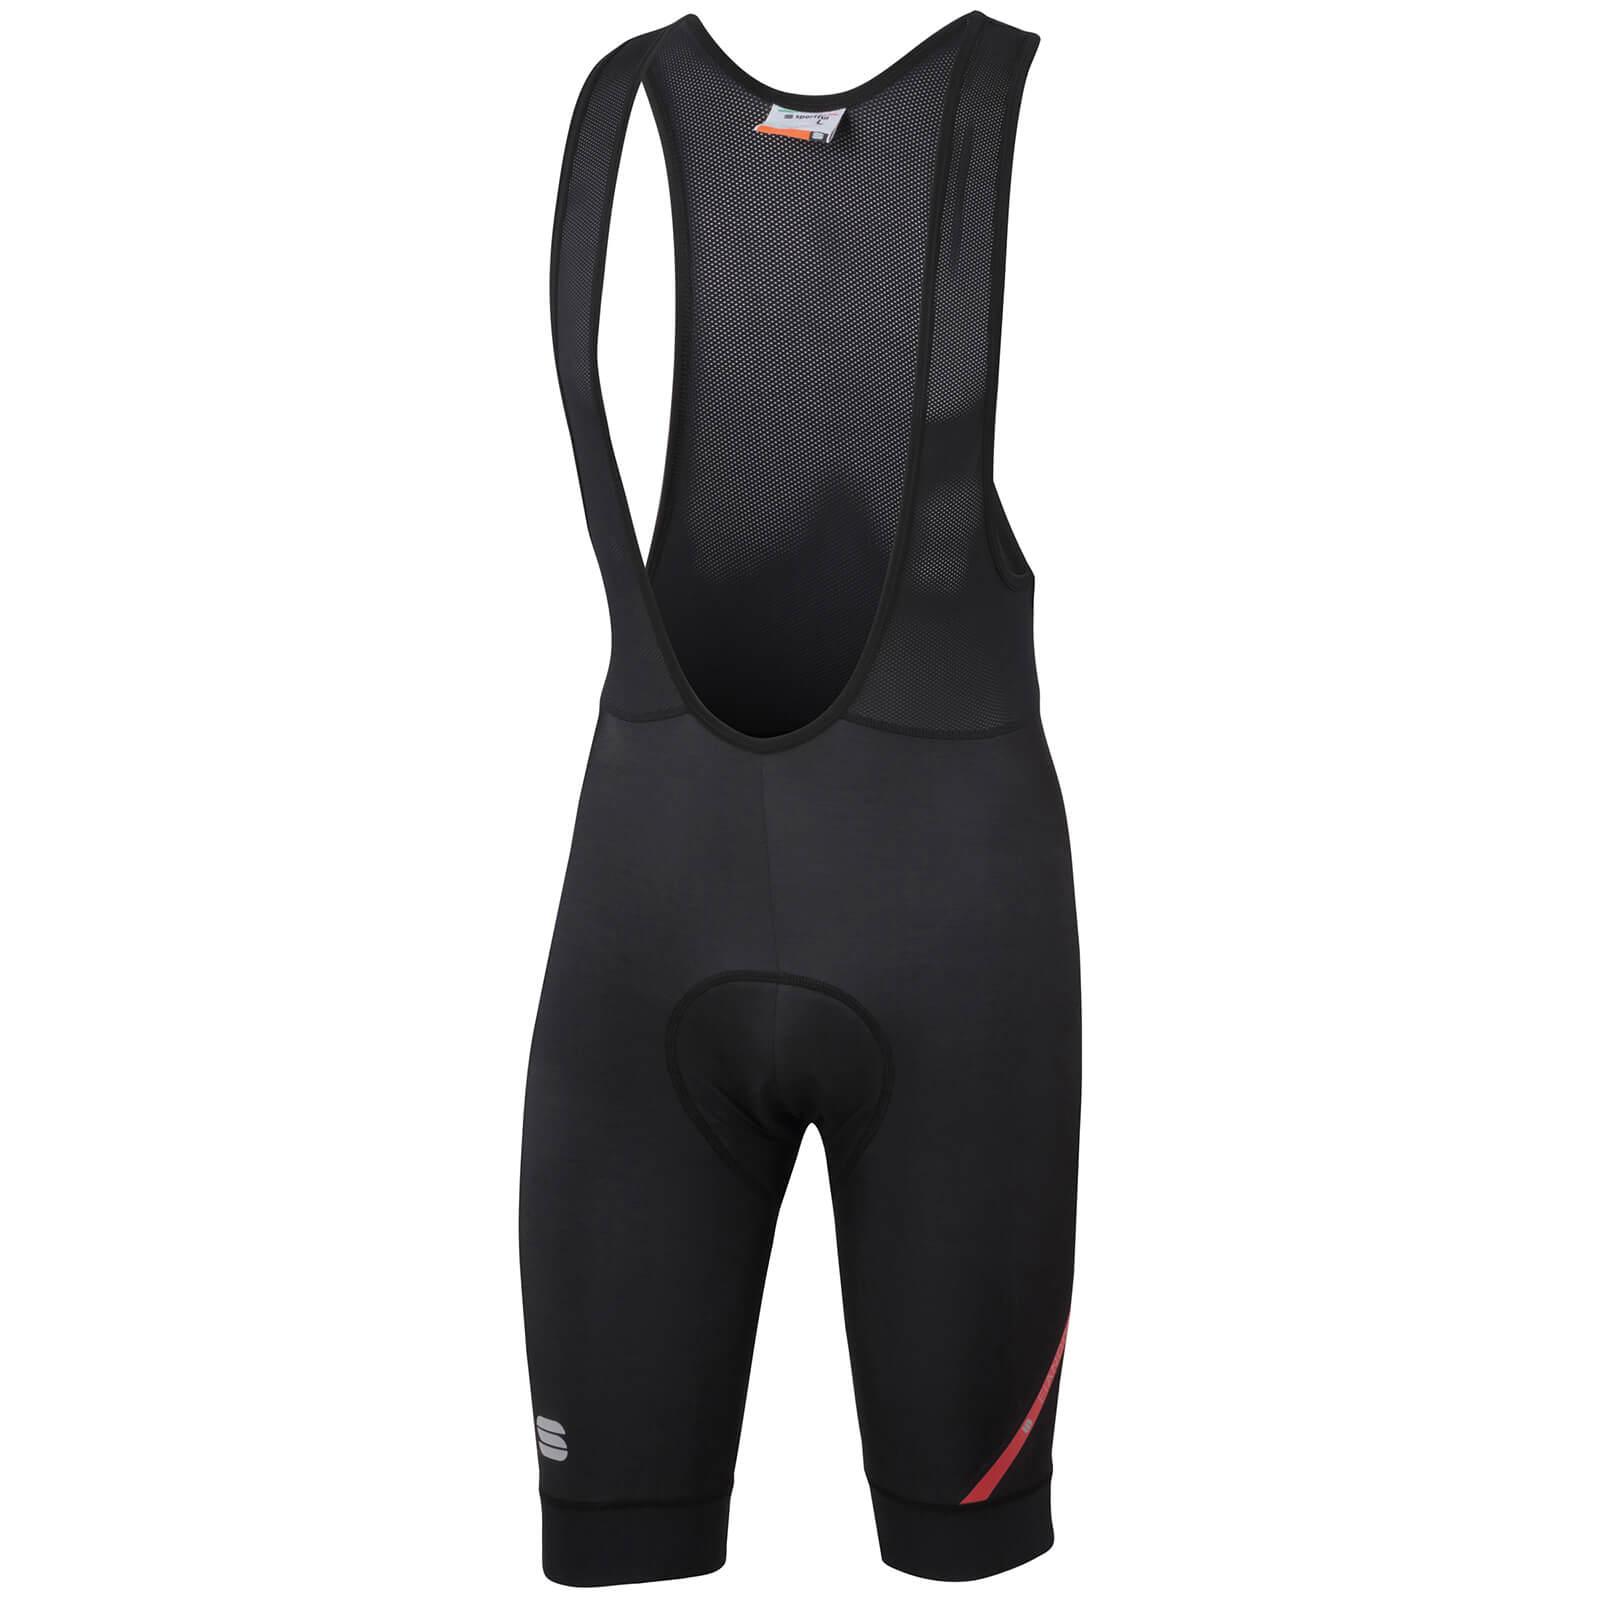 Sportful Fiandre NoRain 2 Bib Shorts - XXL - Black